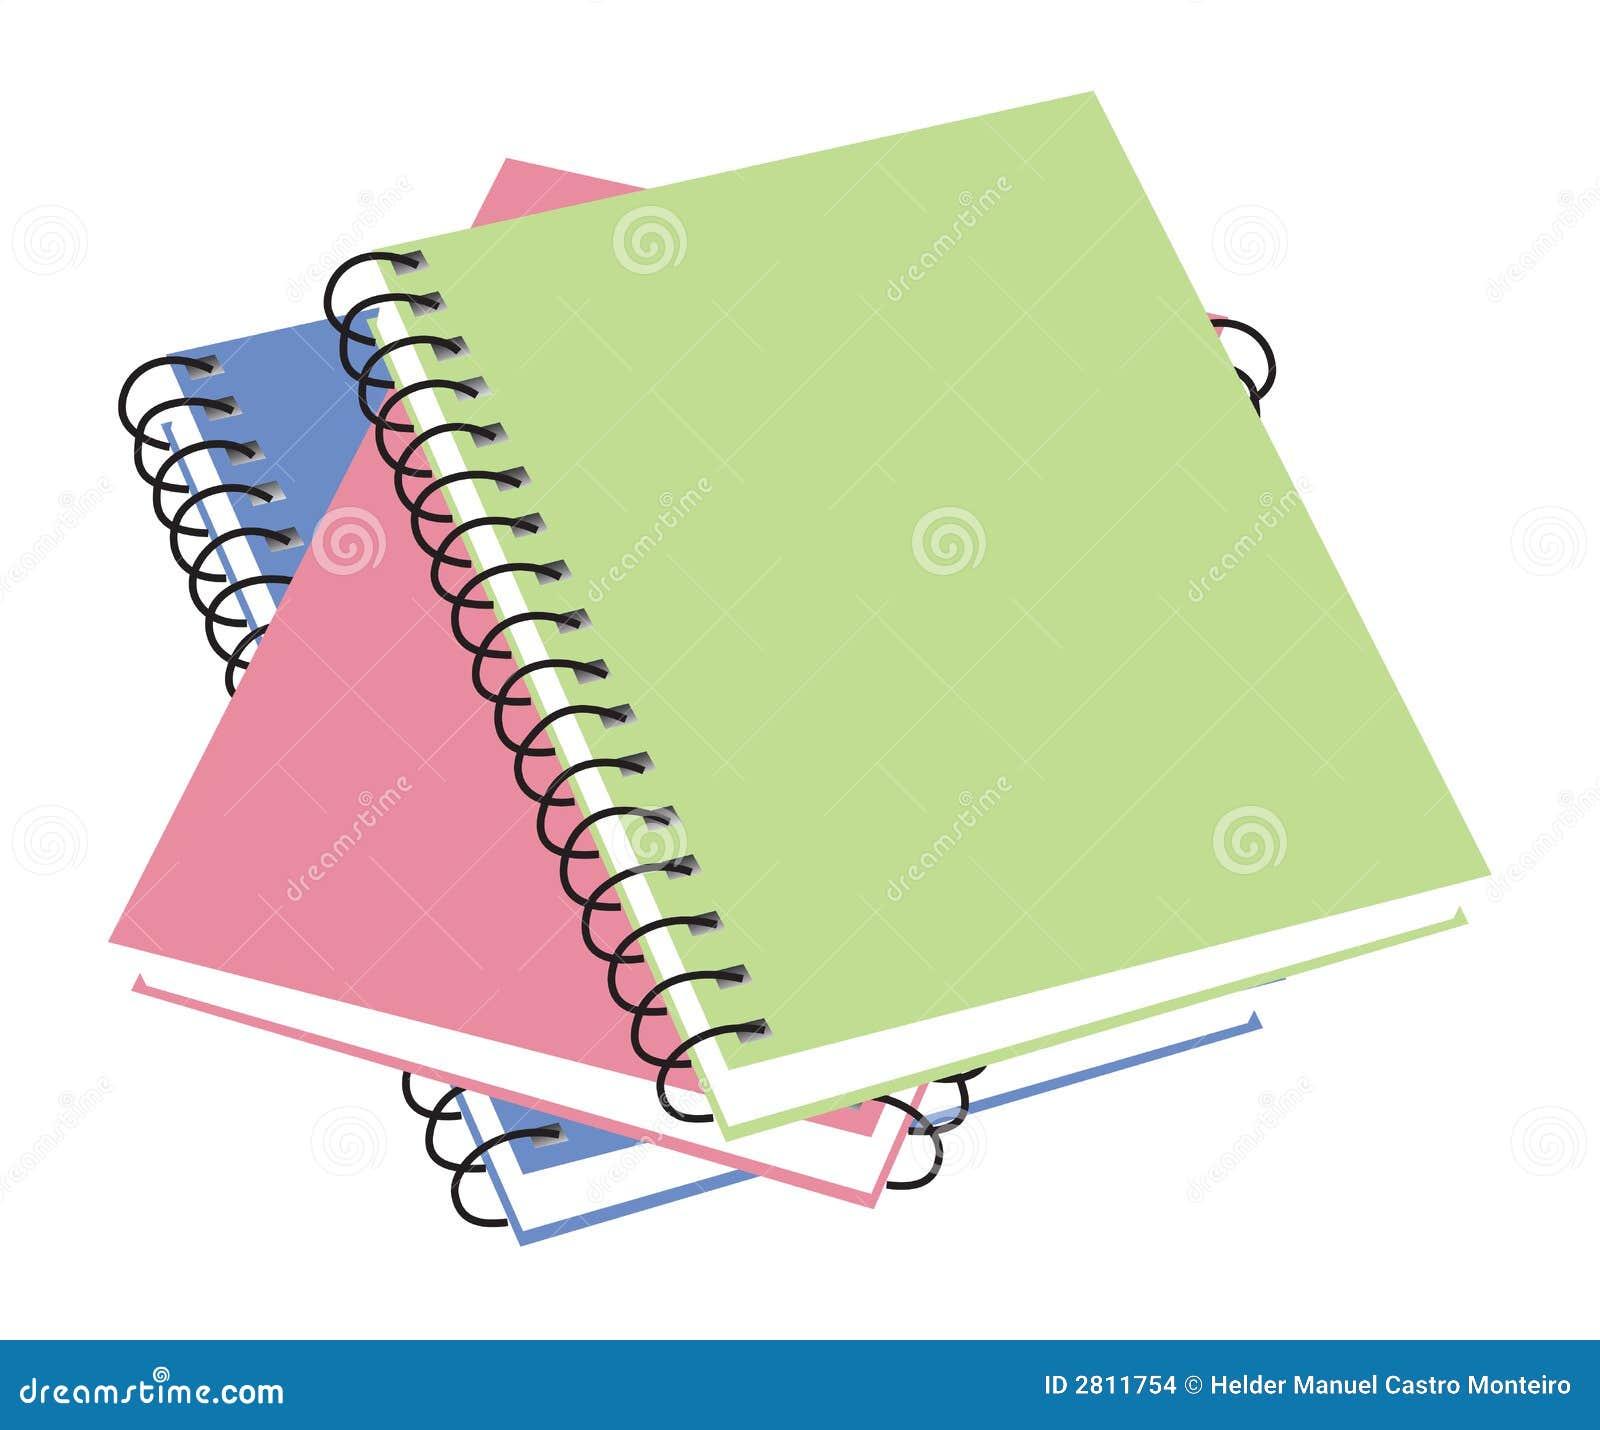 Three notebooks. vector illustration available. Octopus Cartoon Images